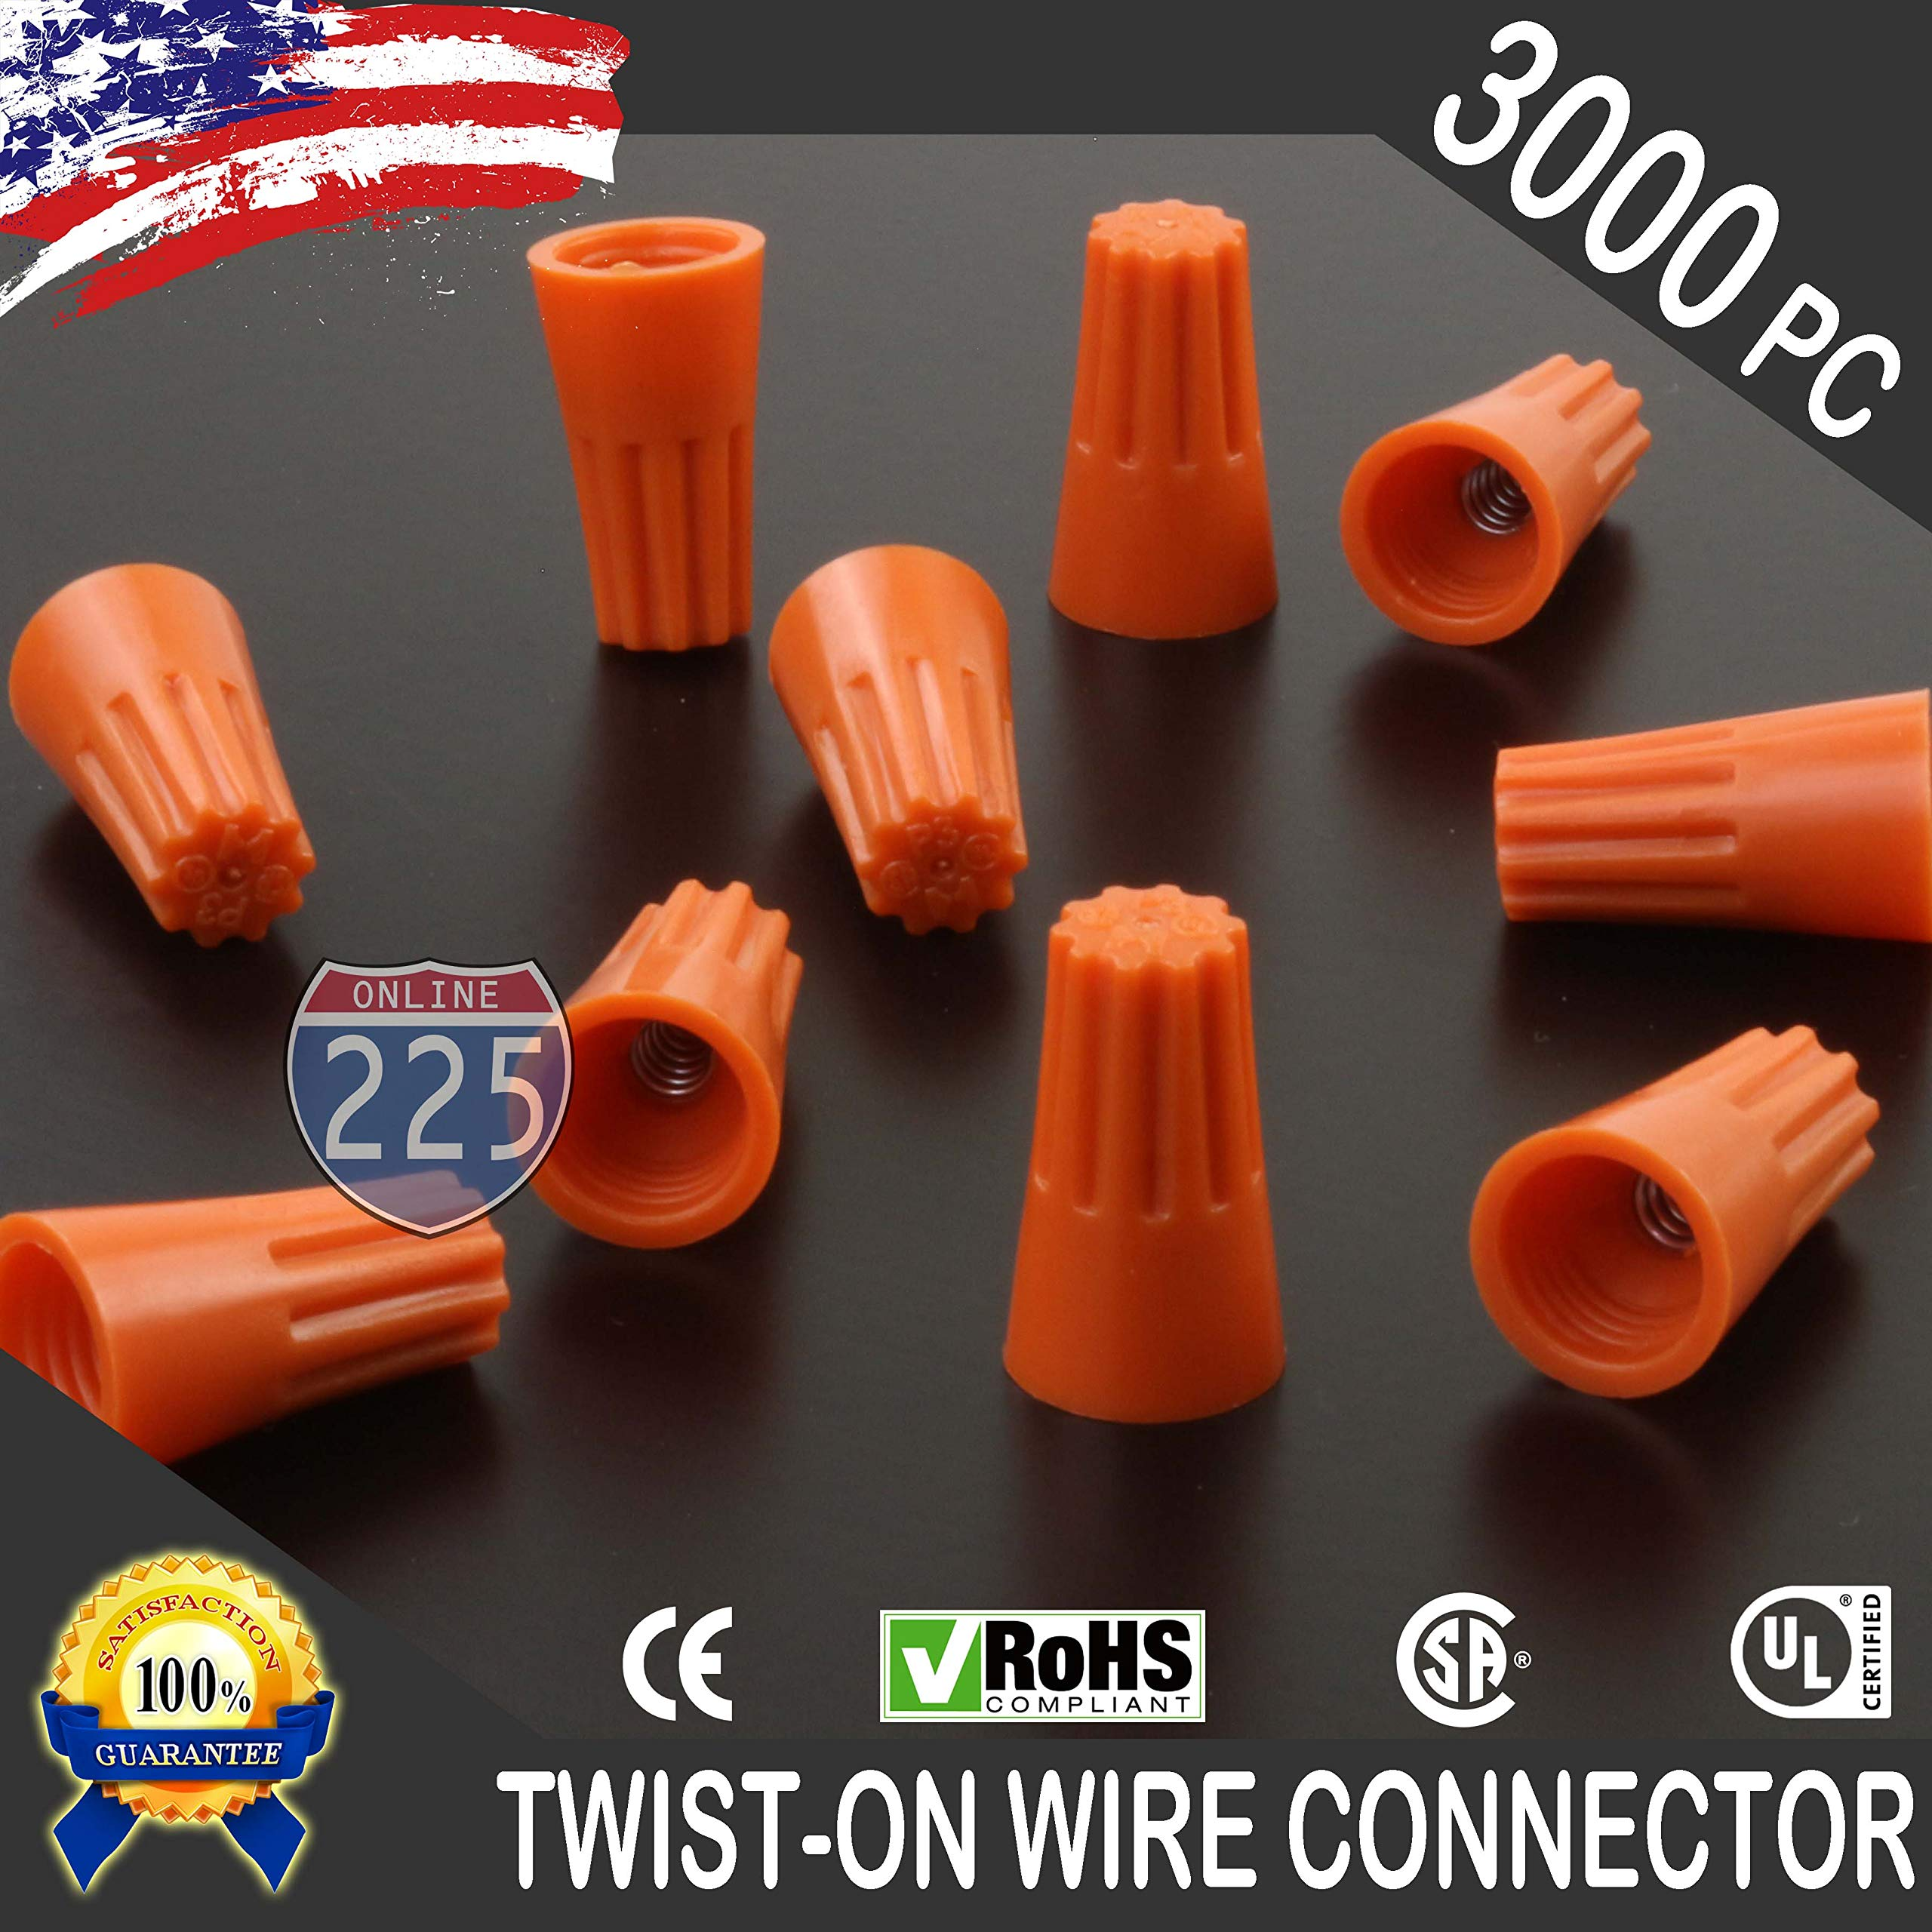 3000 PCS Orange 22-14 Gauge Twist On Wire Gard Connectors Conical Nuts Barrel Screw US